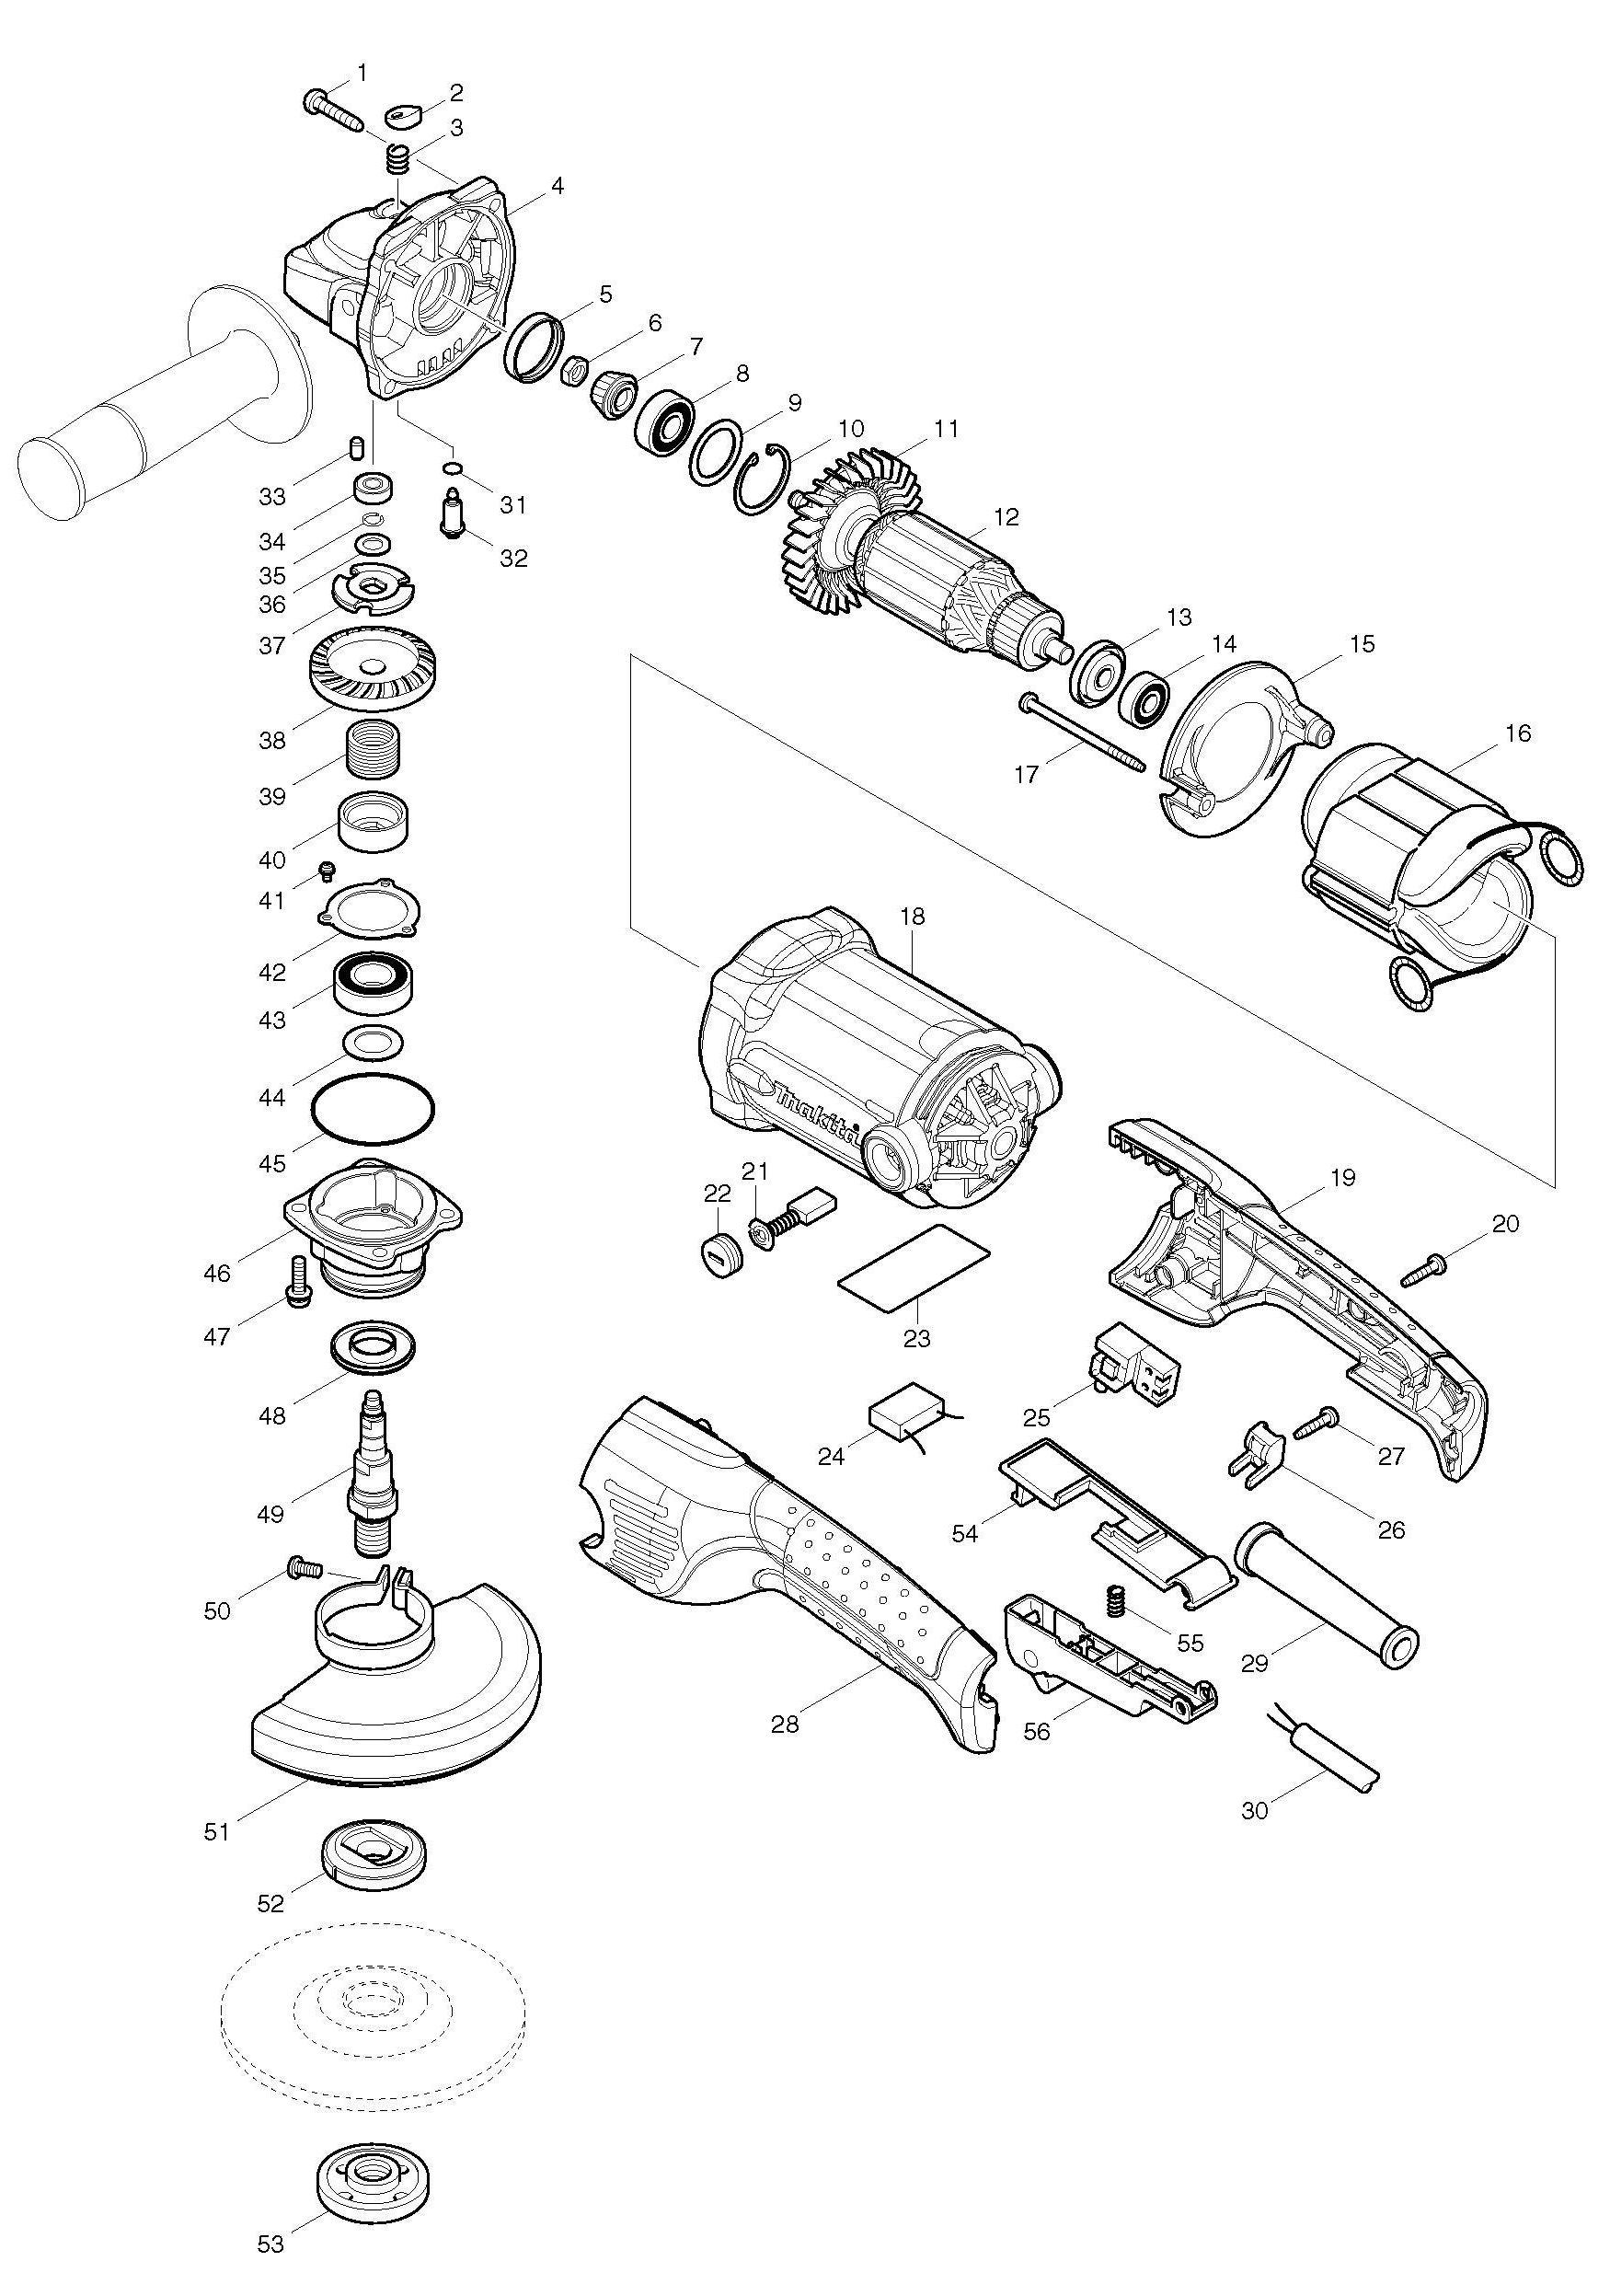 Spares For Makita Ga 125mm Angle Grinder Spare Ga